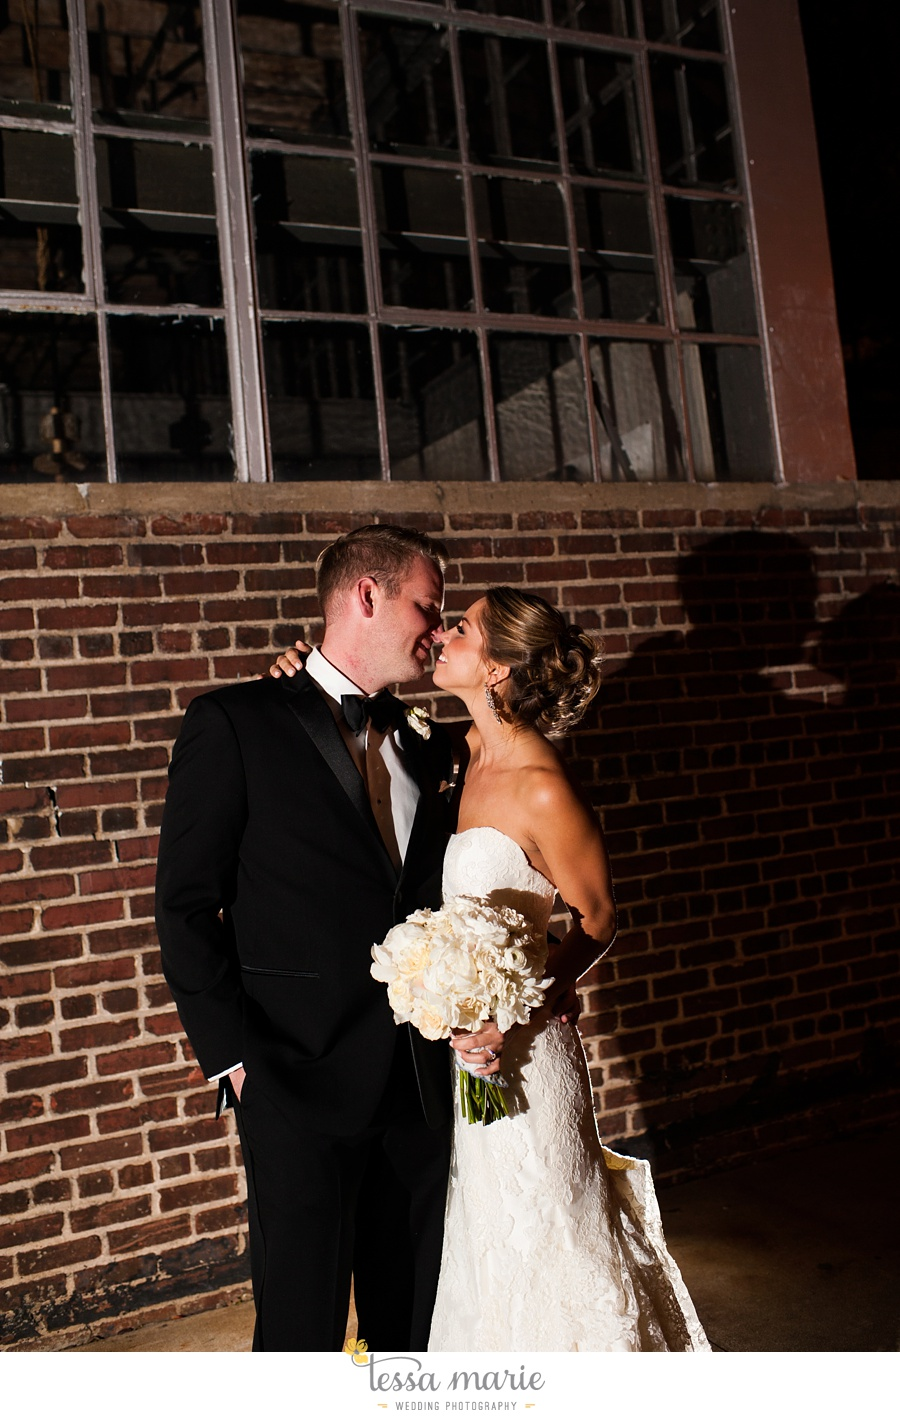 342_tessa_marie_weddings_emotional_moments_photography_king_low_wedding_sam_neil_best_atlanta_wedding_photographer